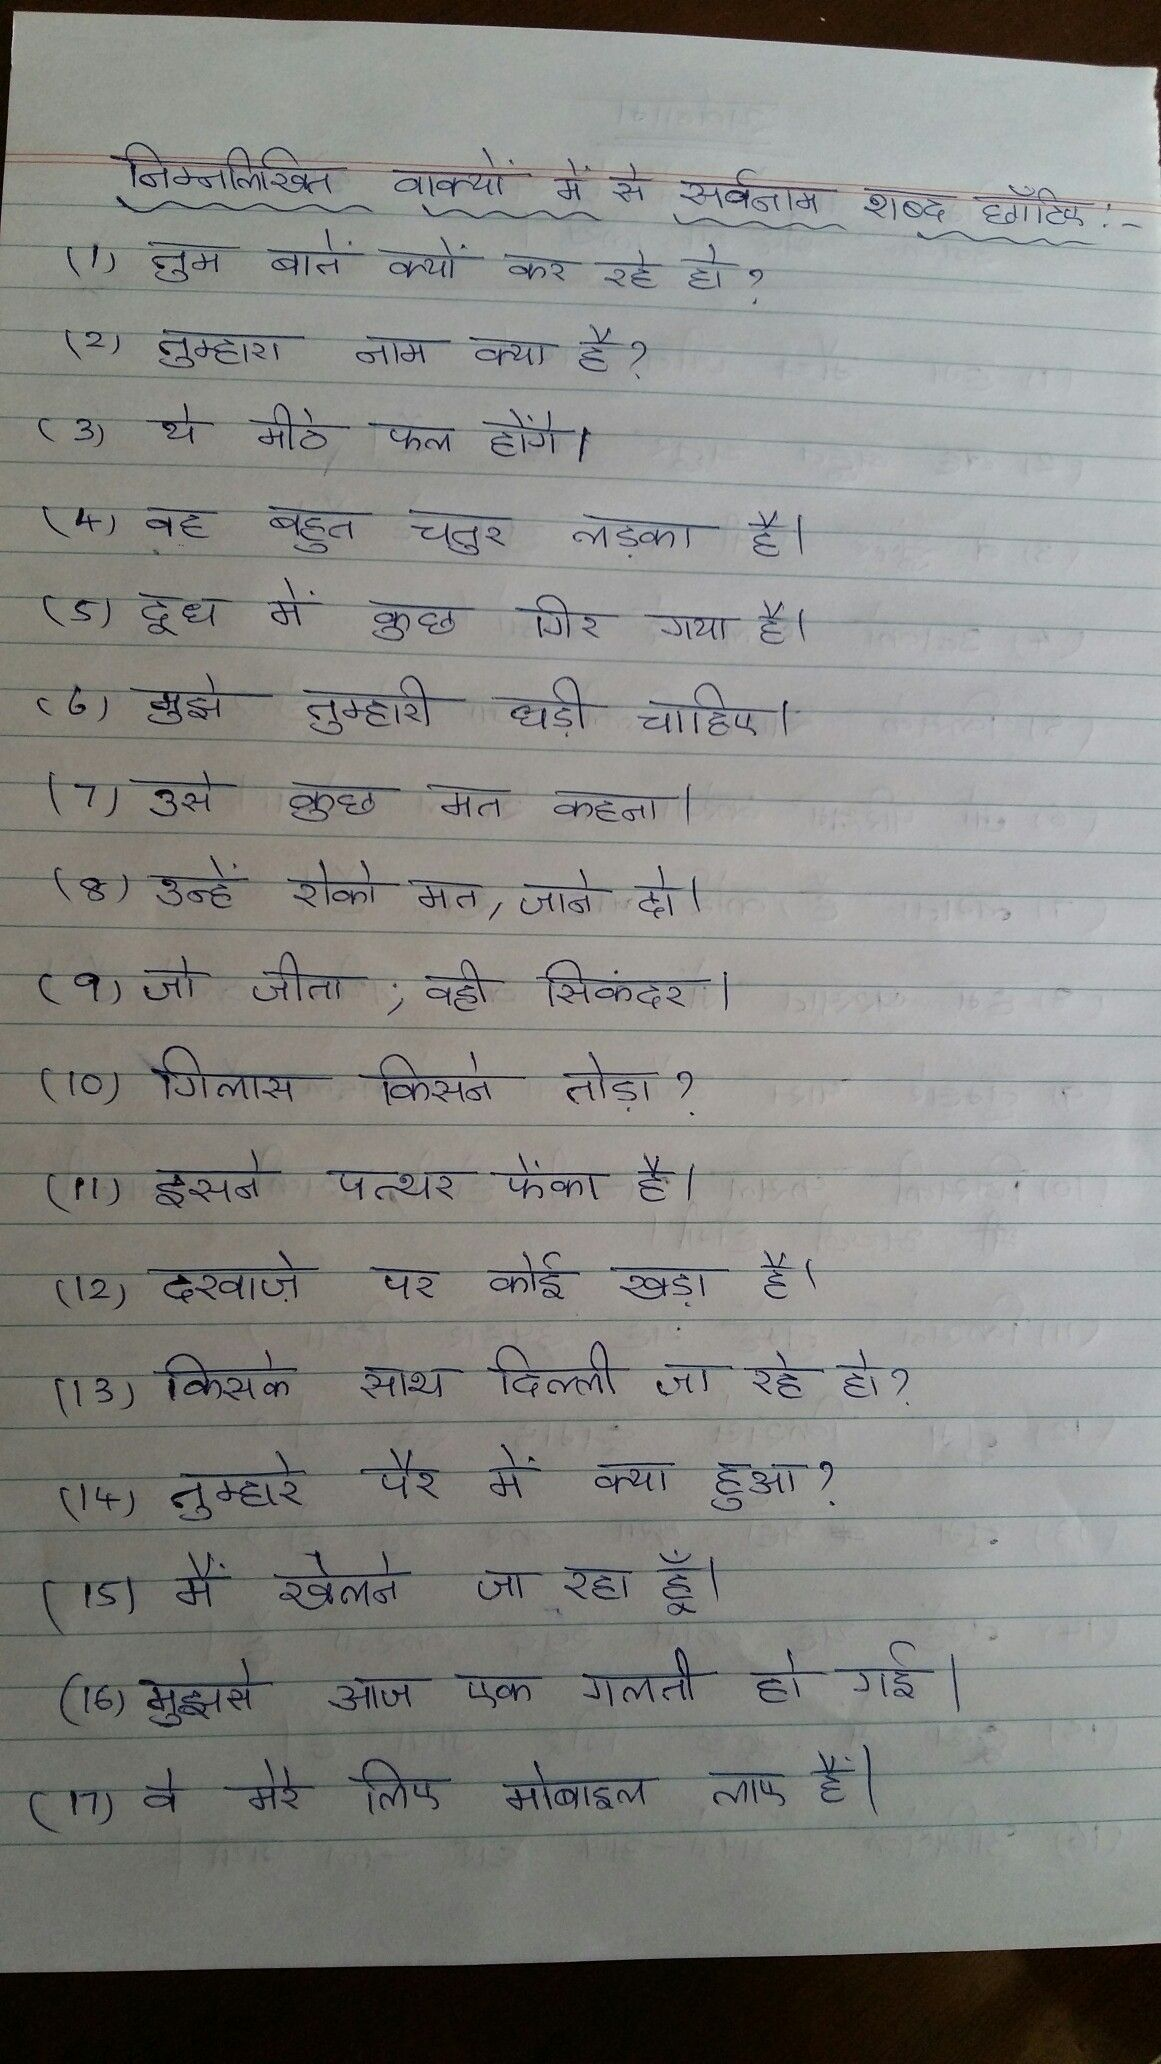 medium resolution of Hindi grammar -SARVANAM WORKSHEETS -PNV   Hindi worksheets